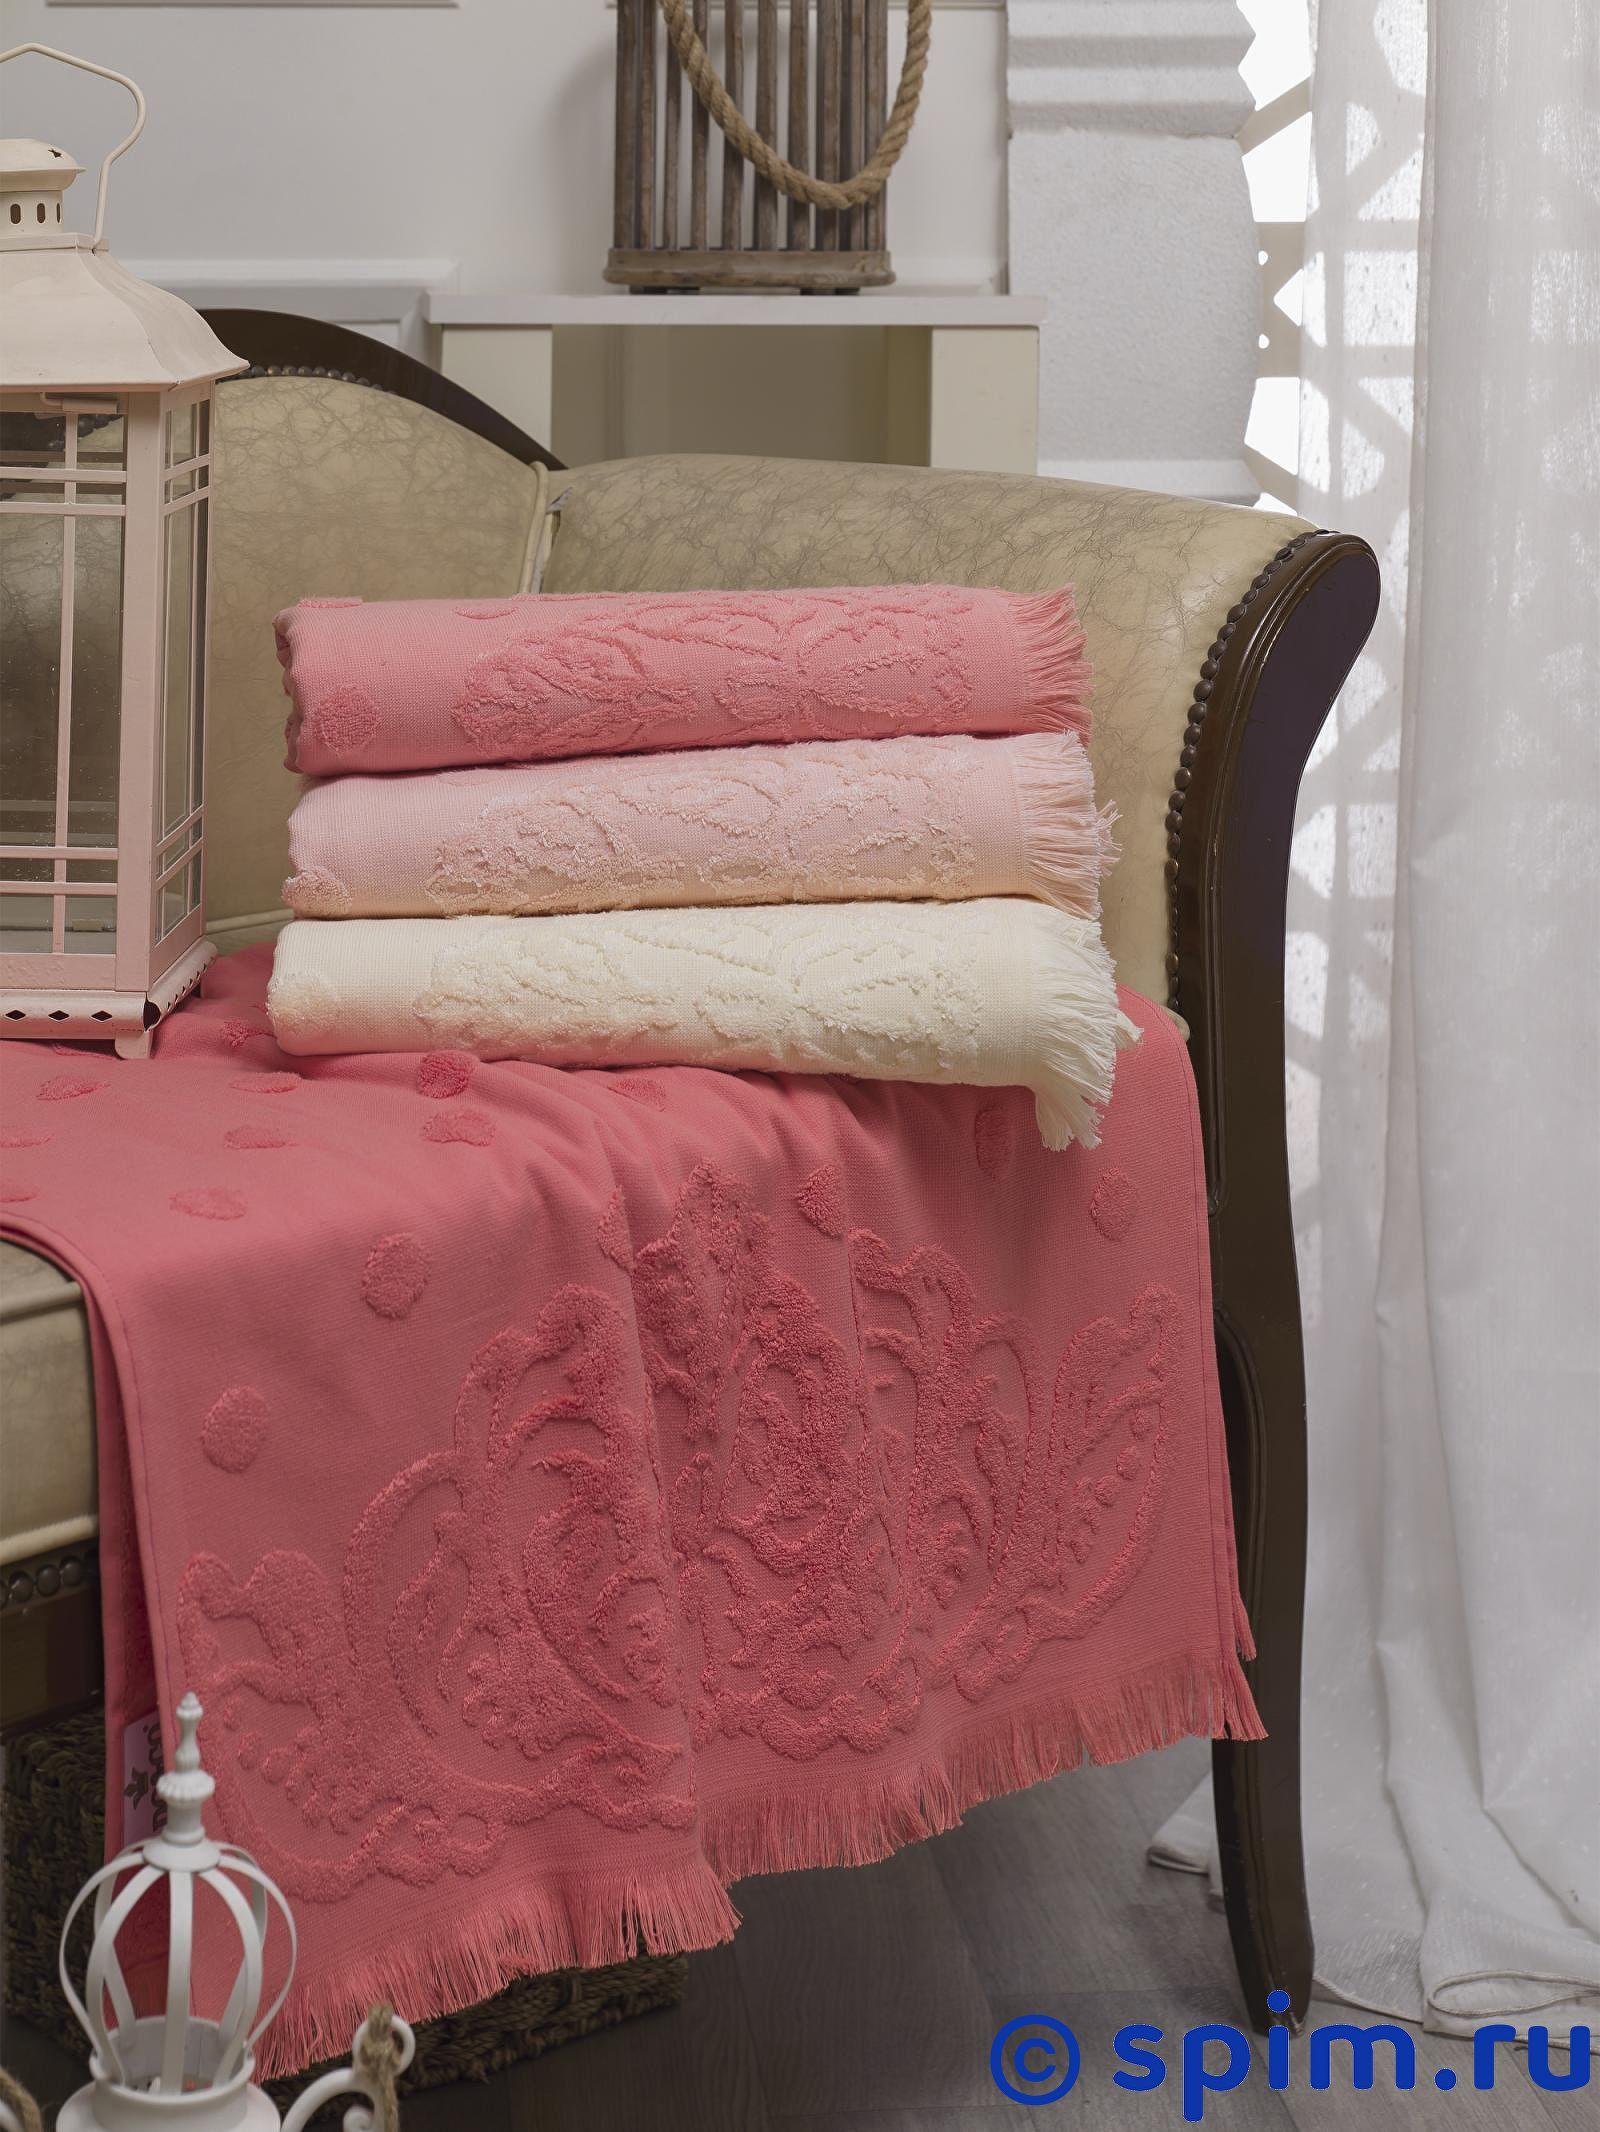 Набор из 4-х полотенец Do&co Damask 50х90 см полотенца do n co полотенце lady цвет мятный набор